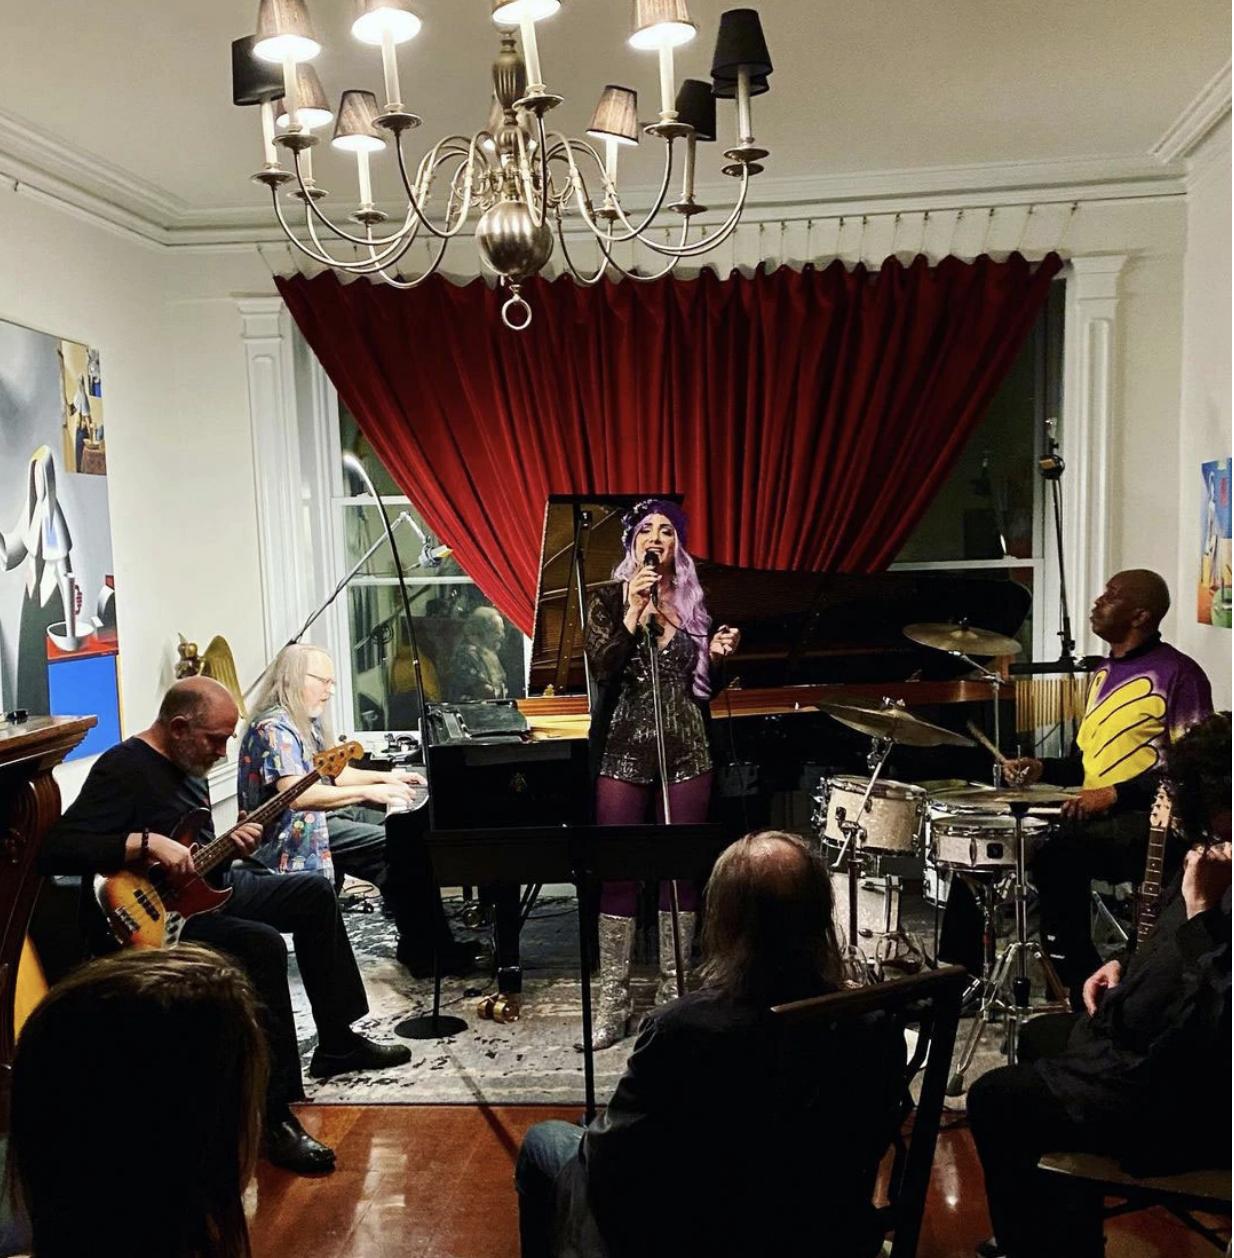 Art Bad Boy Mark Kostabi Hosts All-Star Jam Session at Chelsea Townhouse